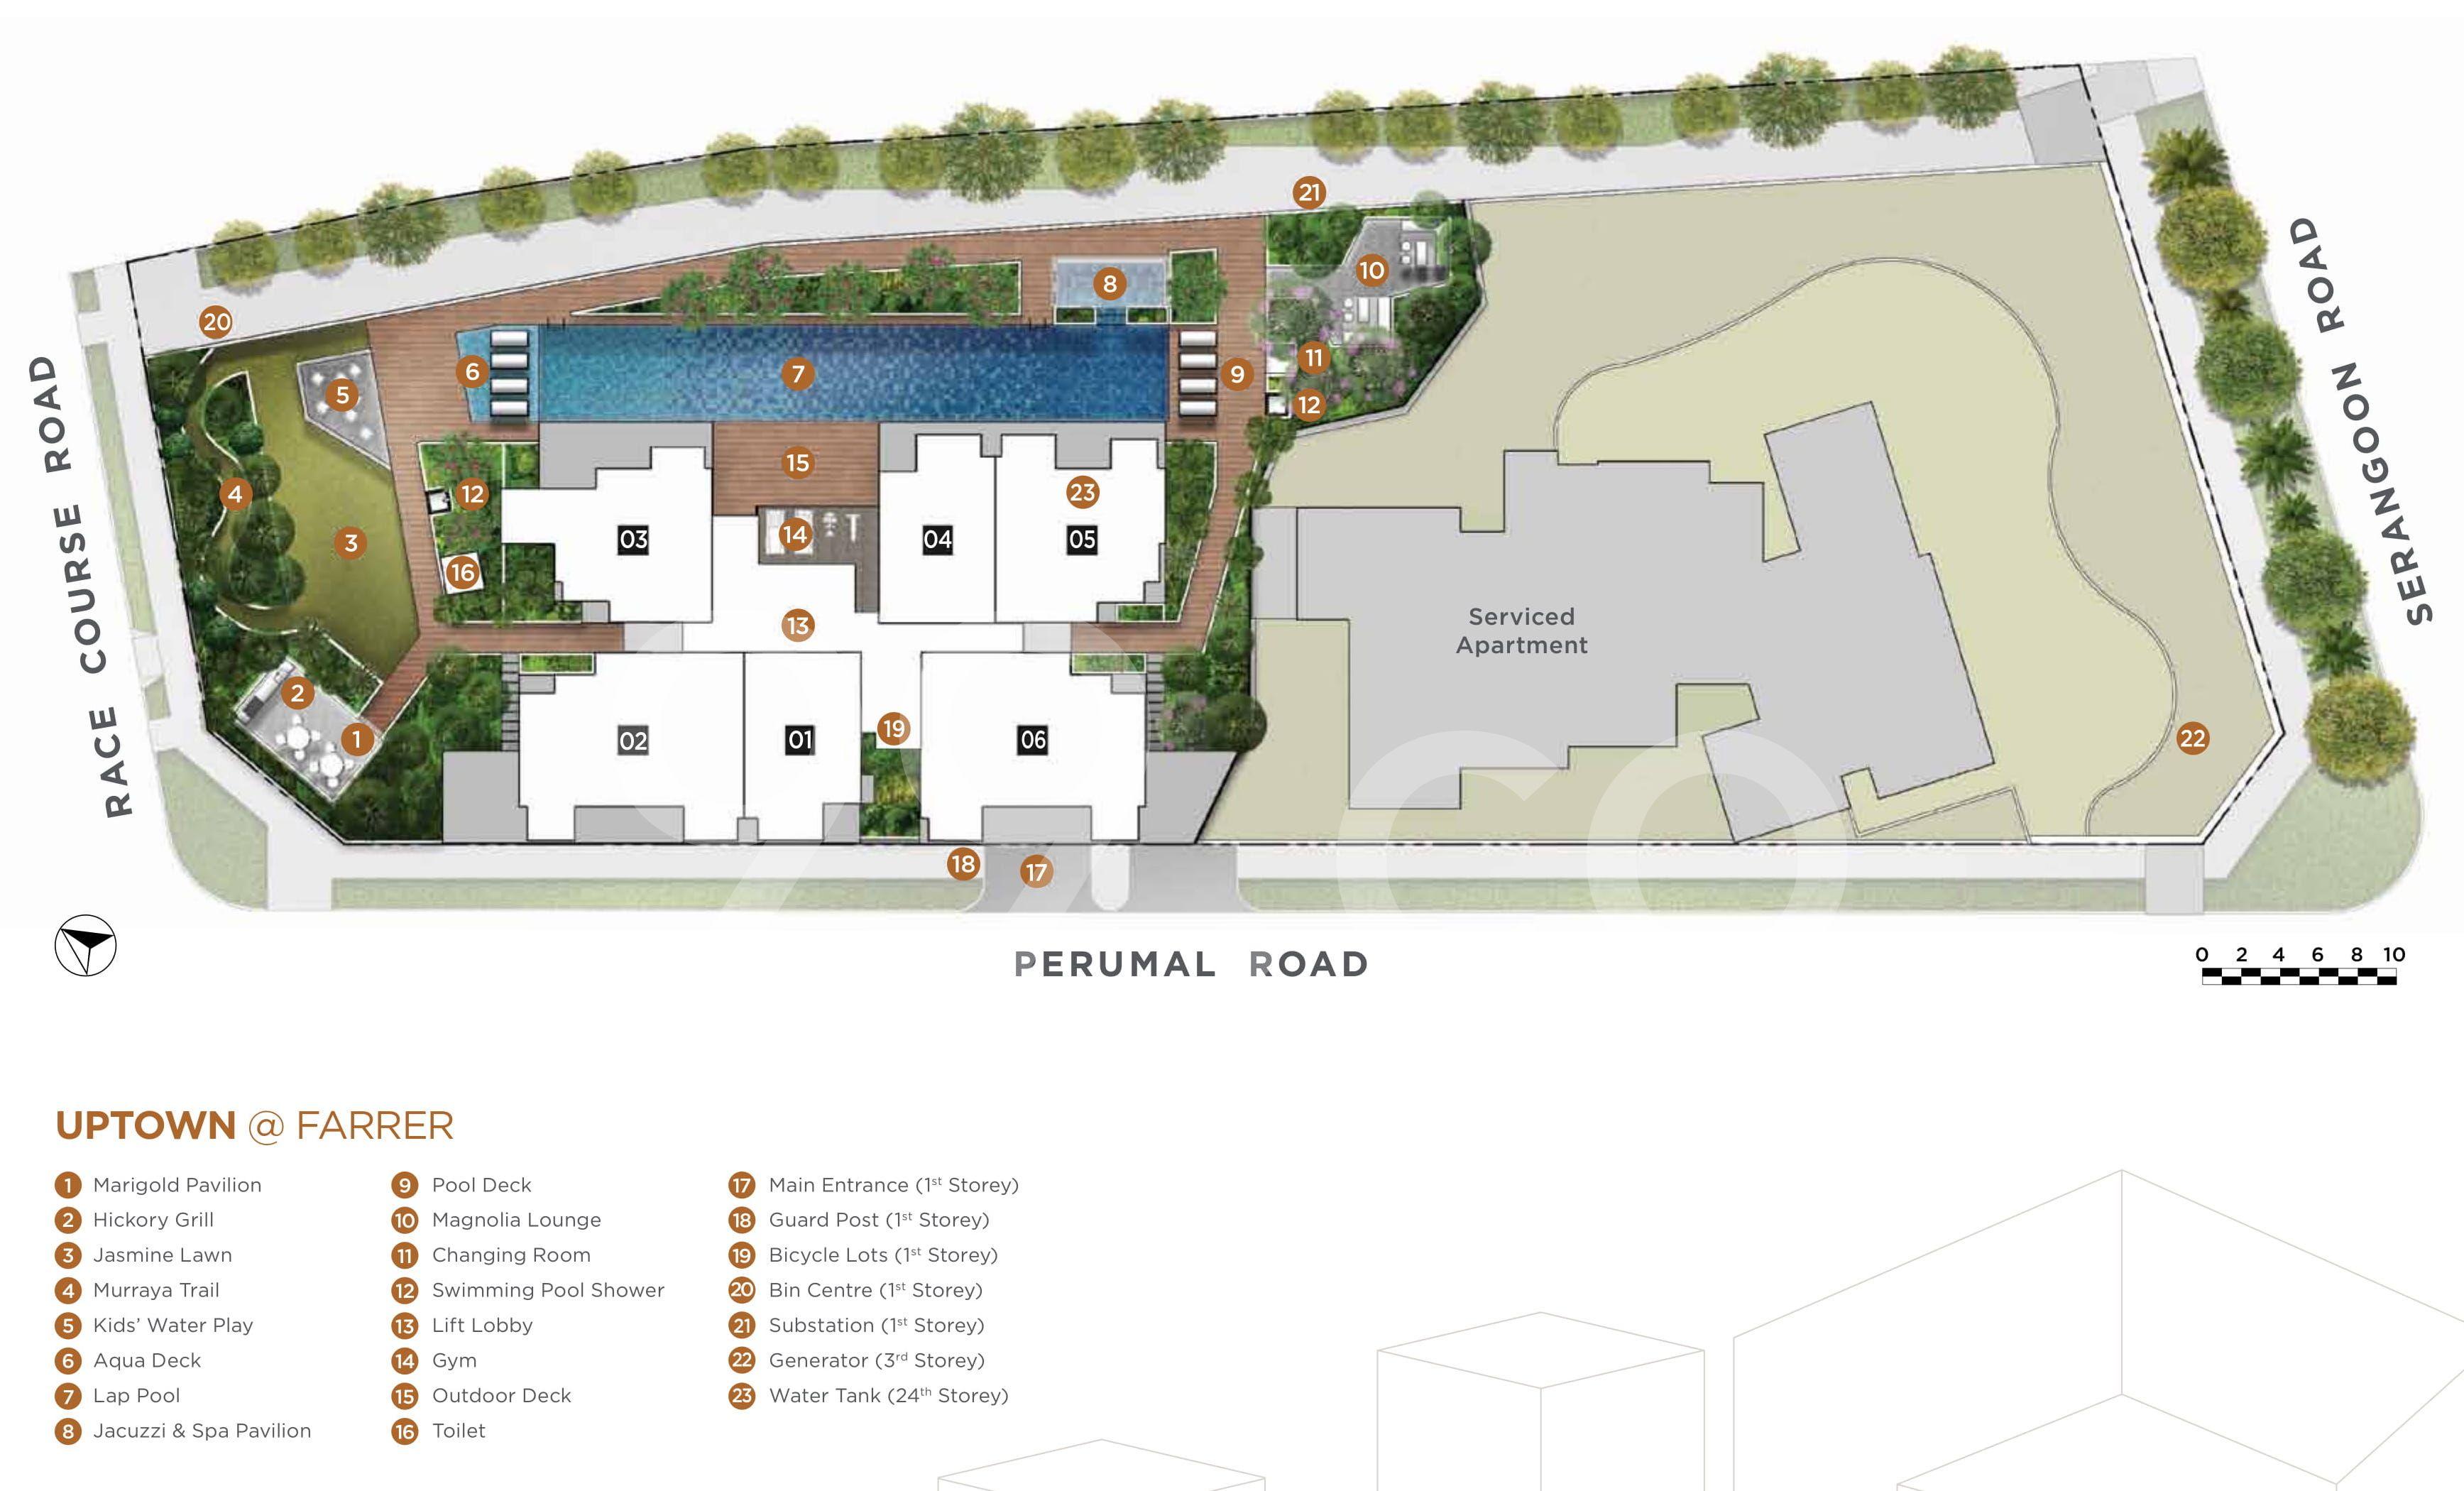 Uptown @ Farrer site plan